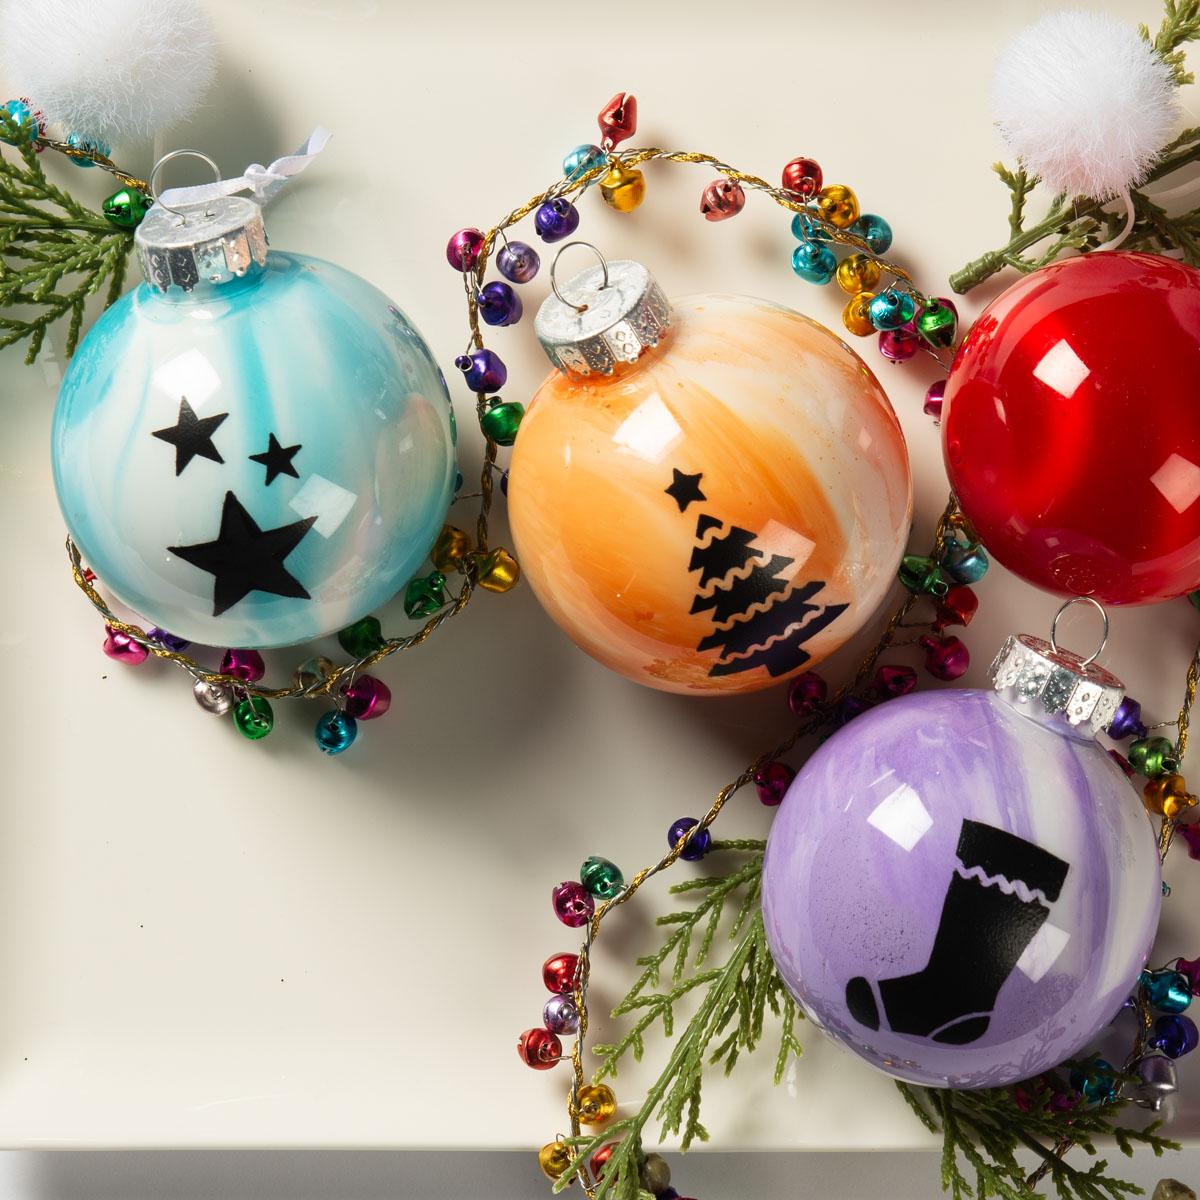 Apple Barrel Poured Ornaments